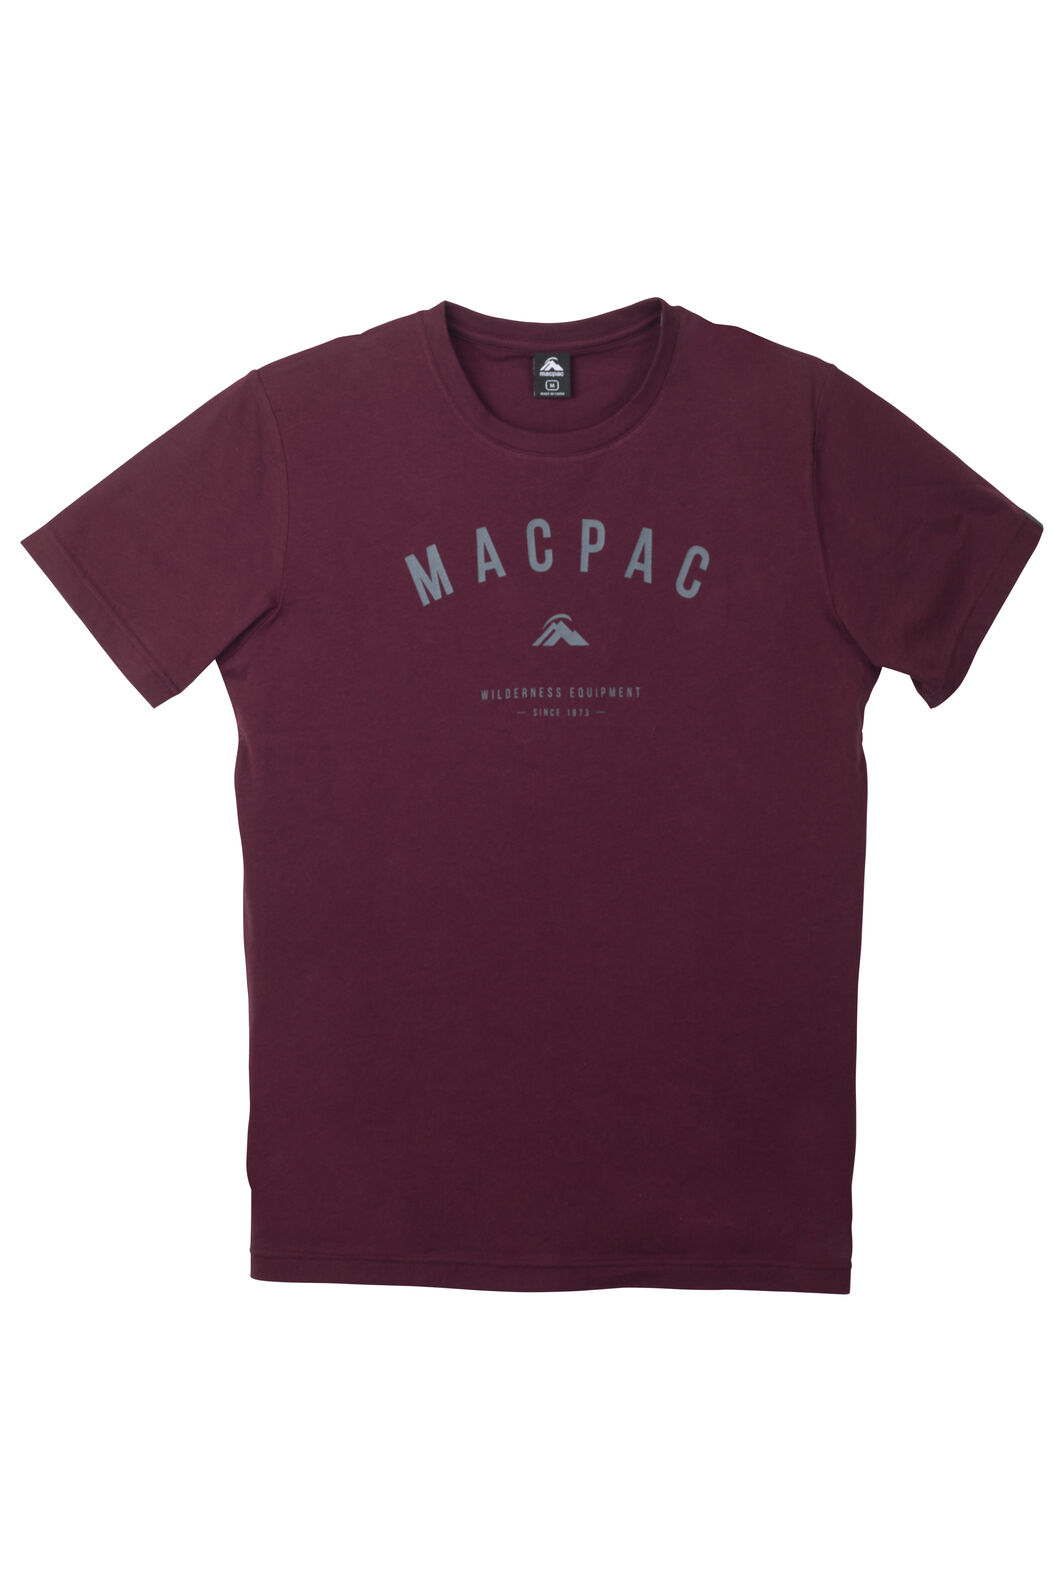 Macpac Graphic Organic Cotton T-Shirt - Men's, Maroon Melange, hi-res